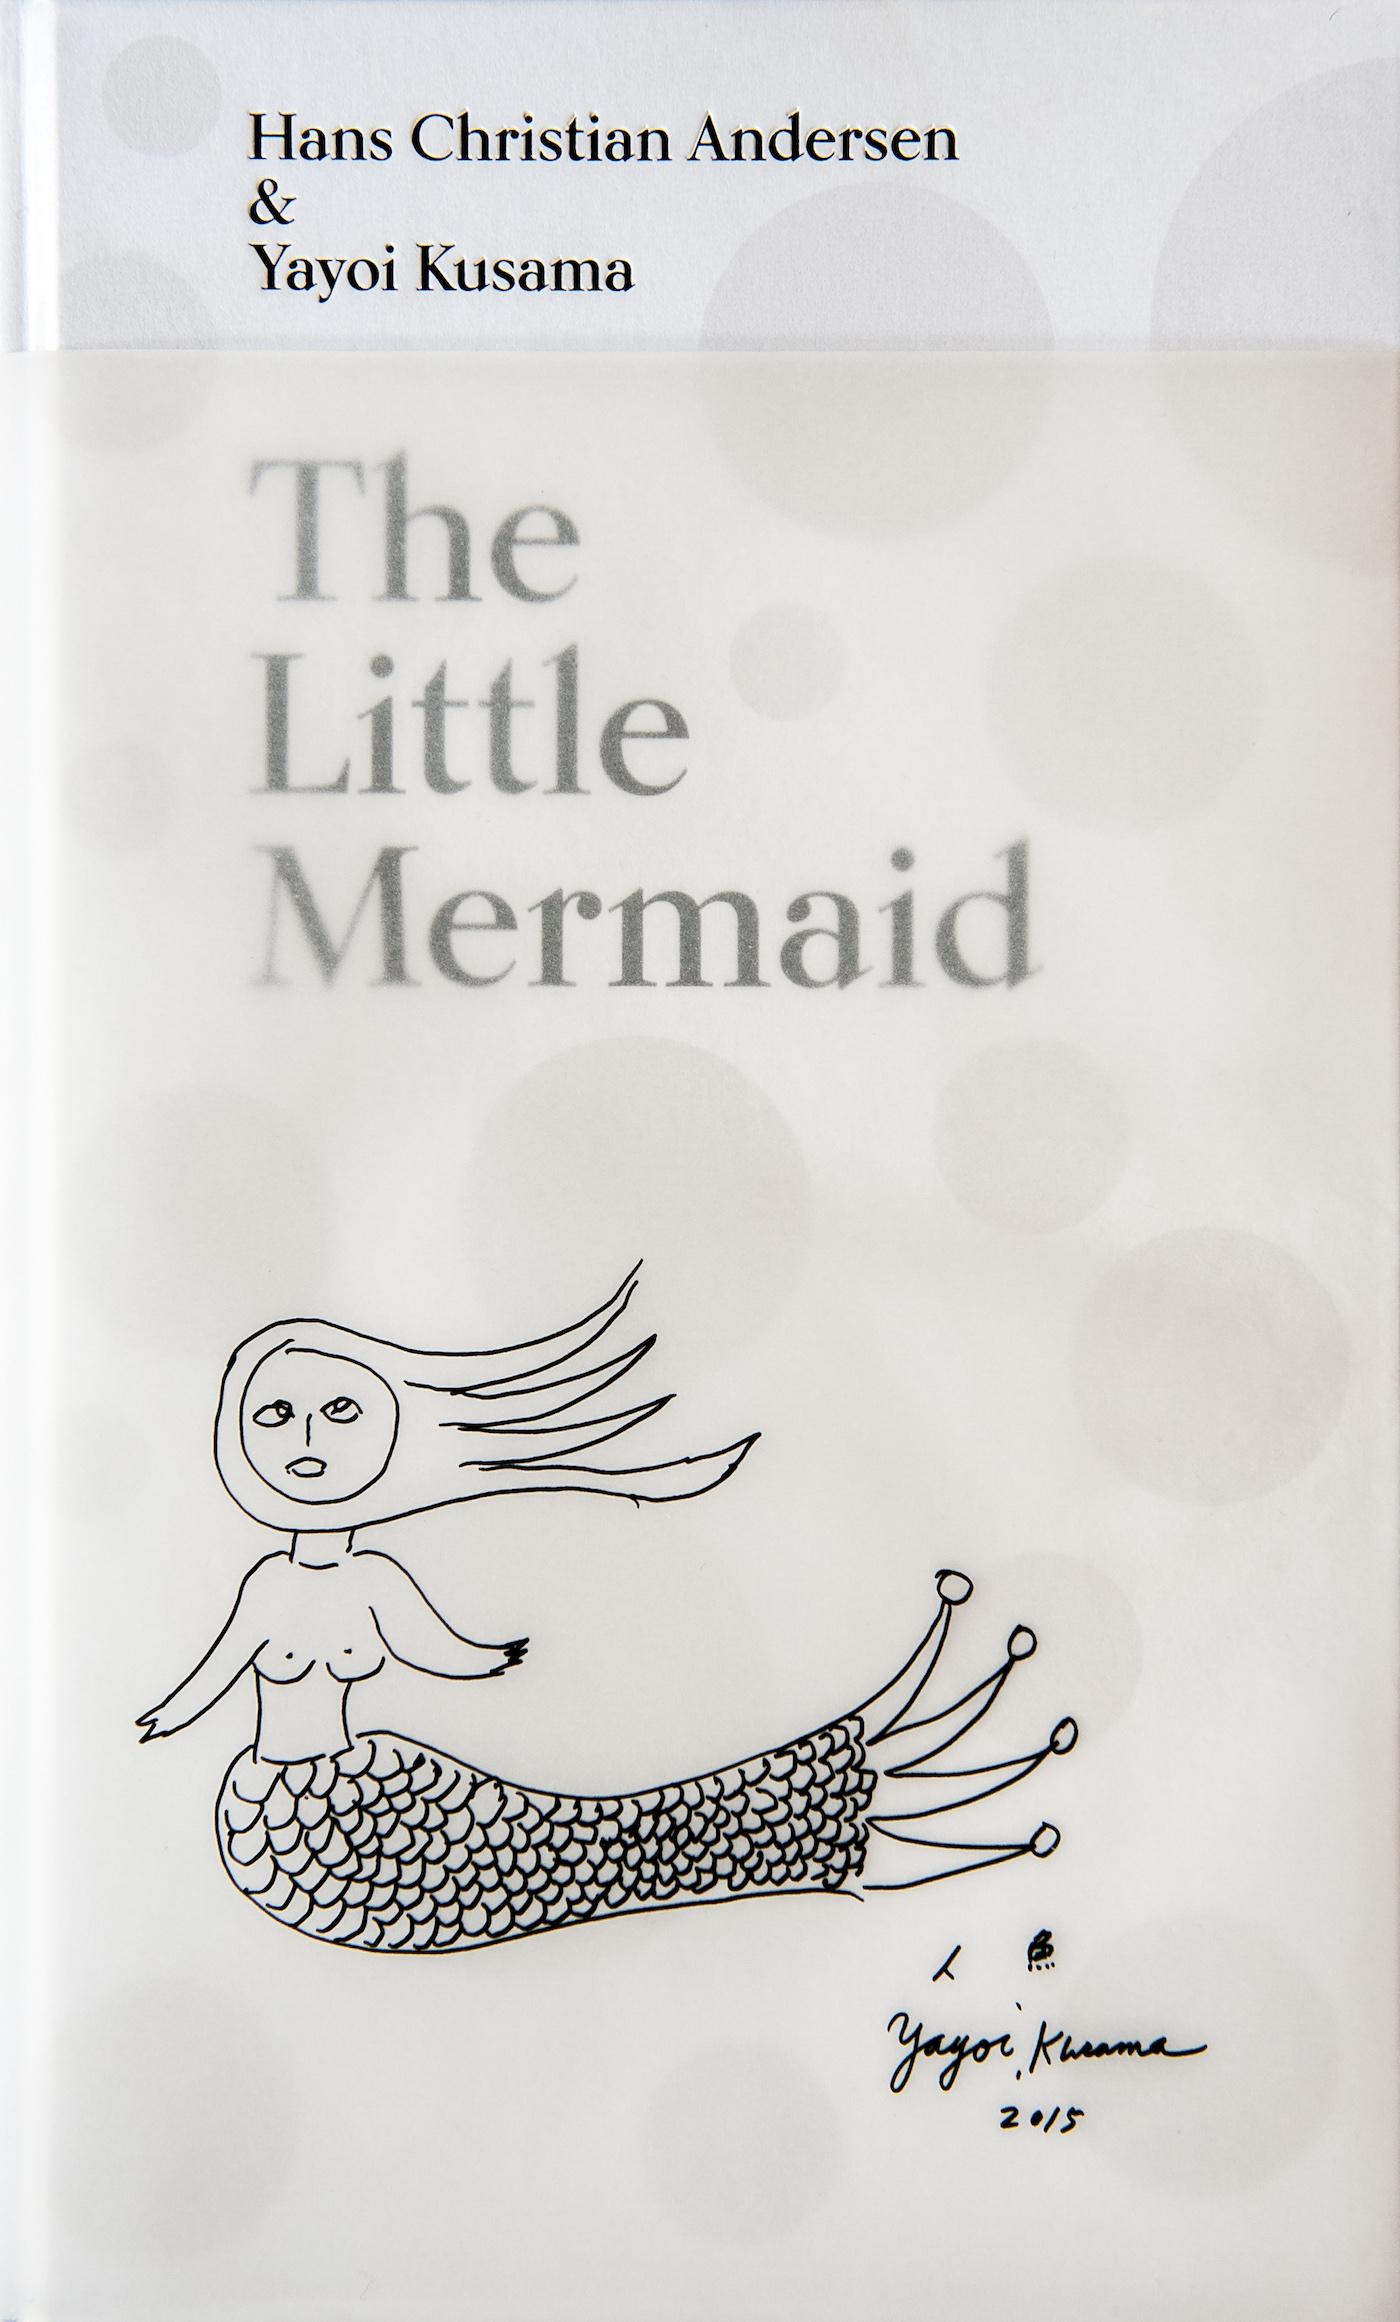 SK_Little_Mermaid_front